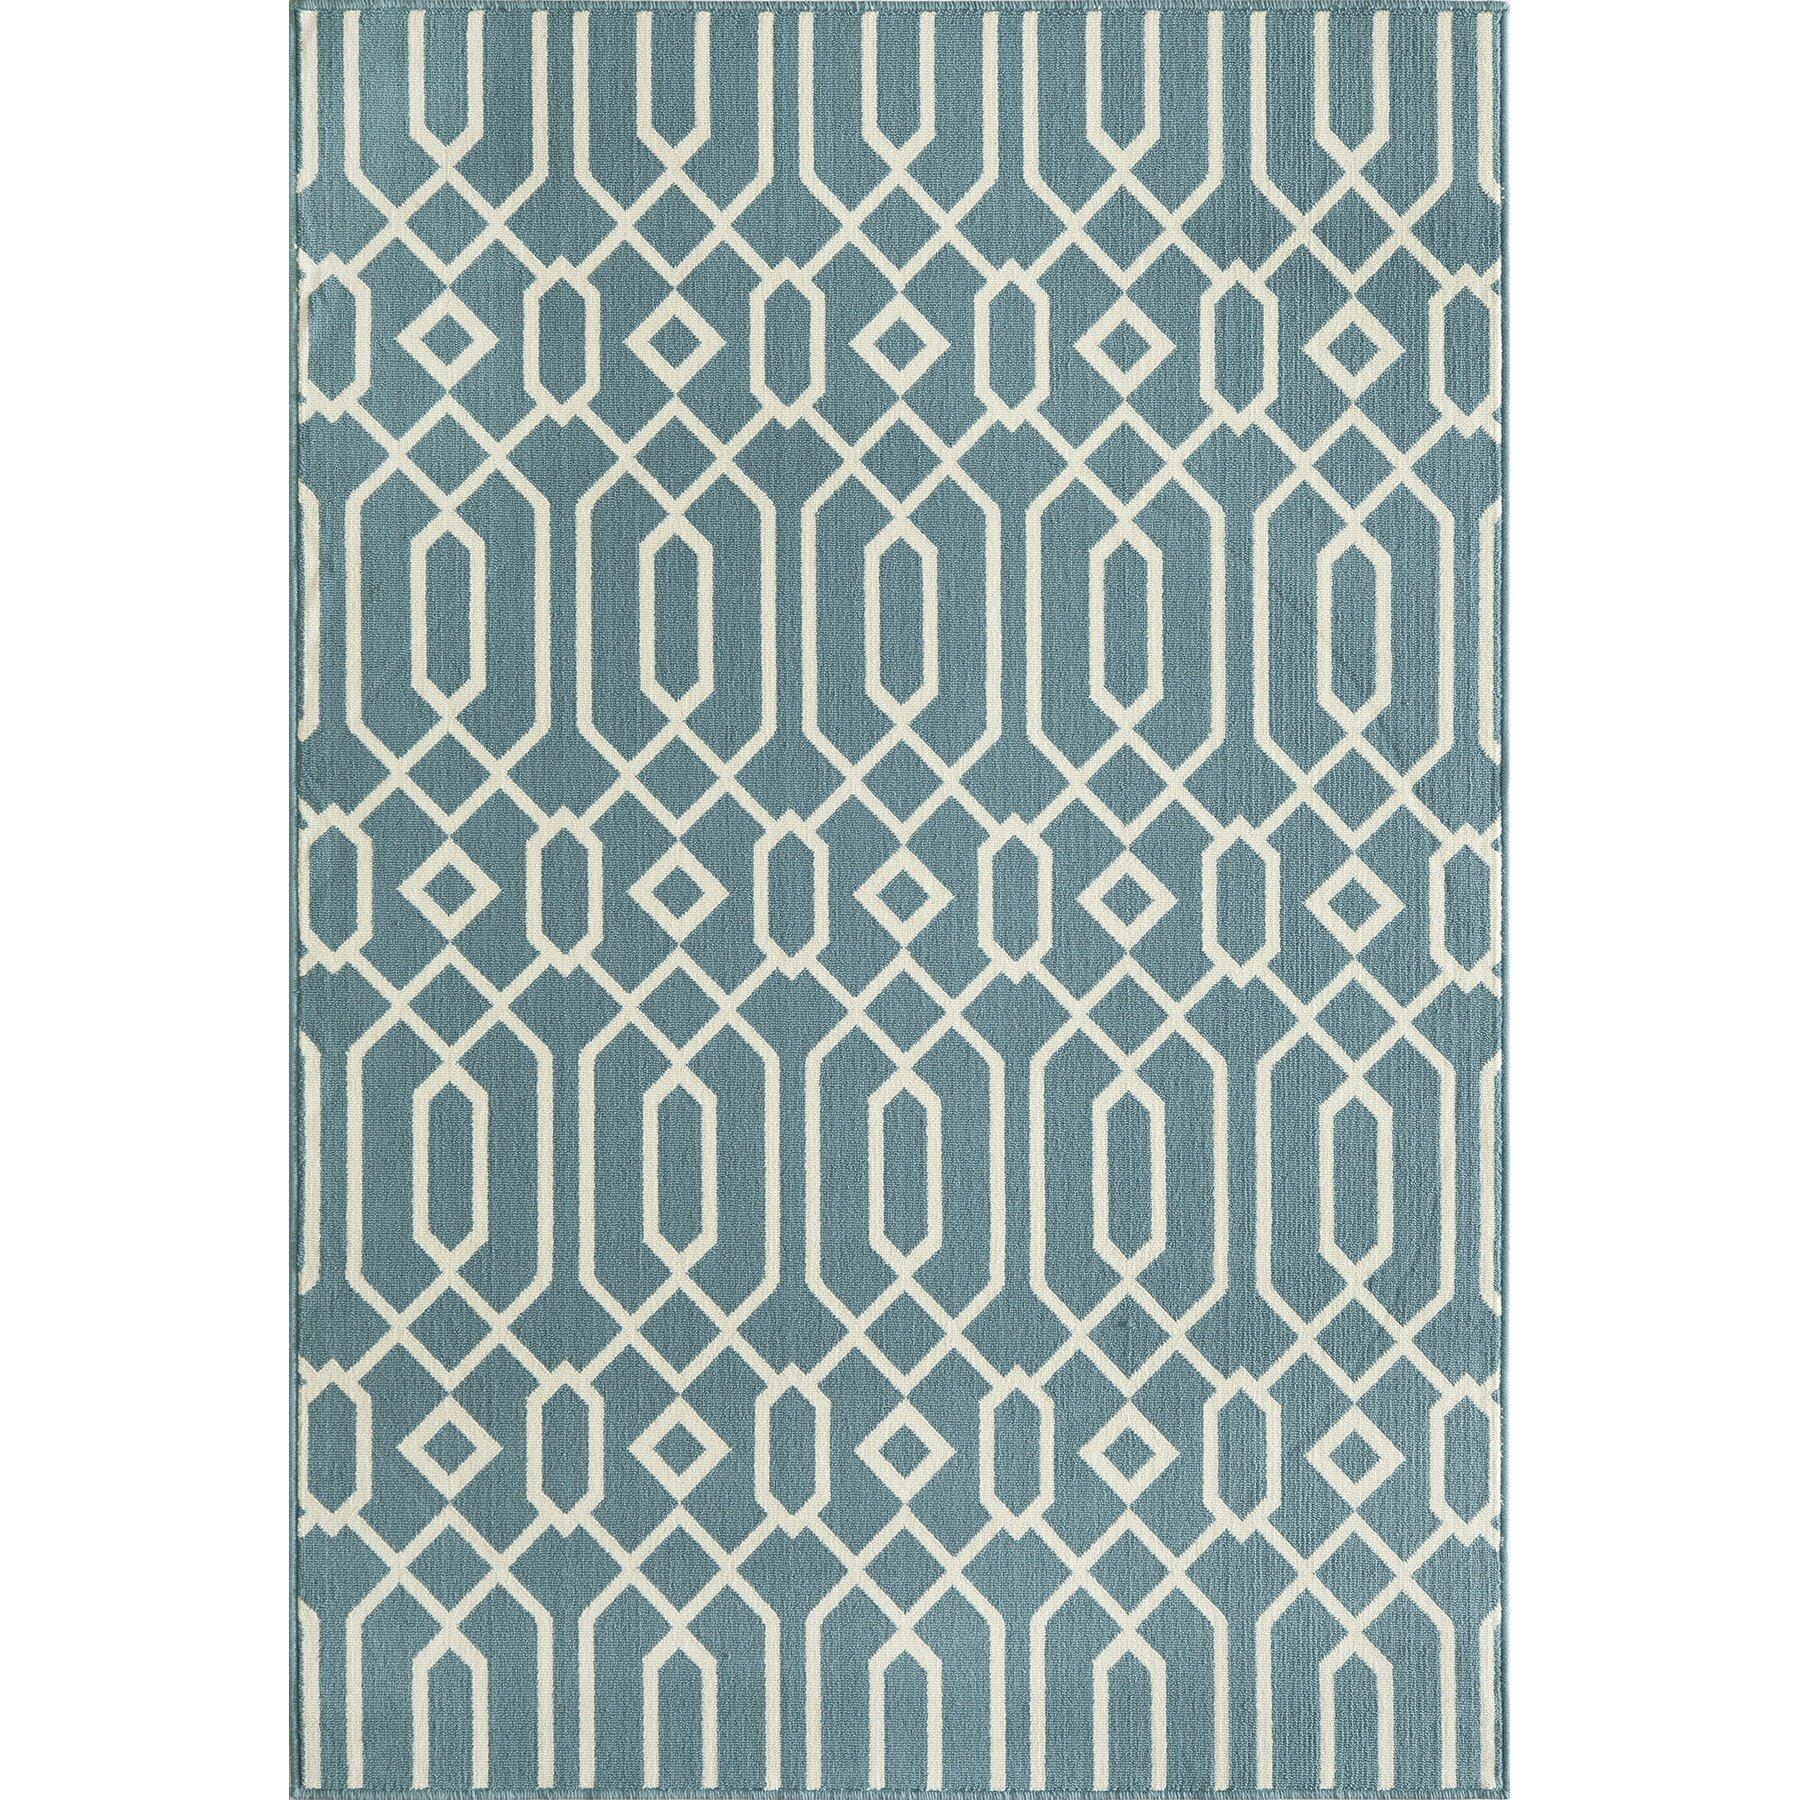 Momeni baja blue indoor outdoor area rug vi reviews for Blue indoor outdoor rug